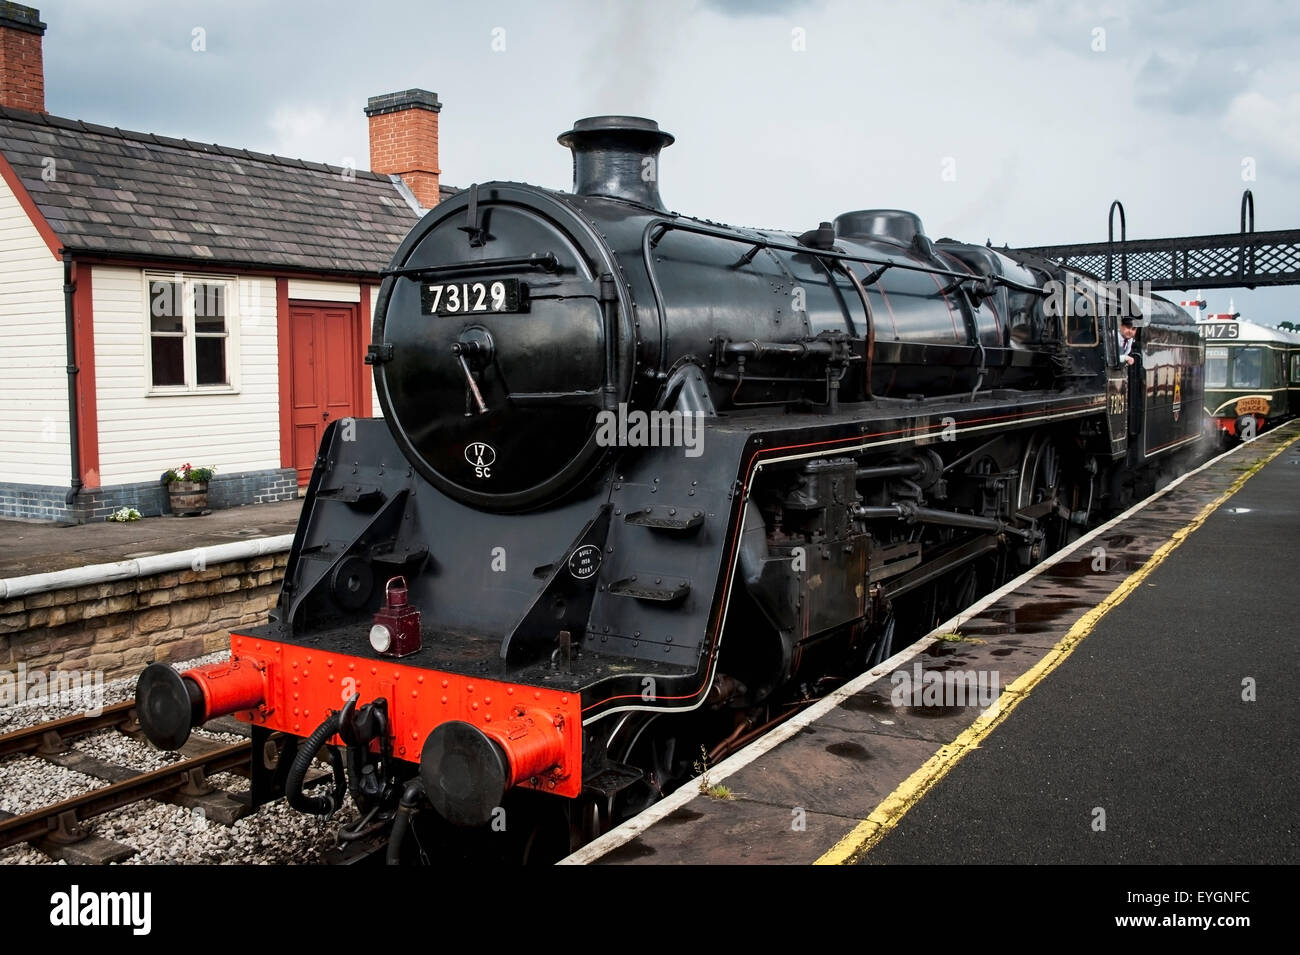 UK, England, Midland Railway; Derbyshire, Steam train arriving at Swanwick Junction - Stock Image